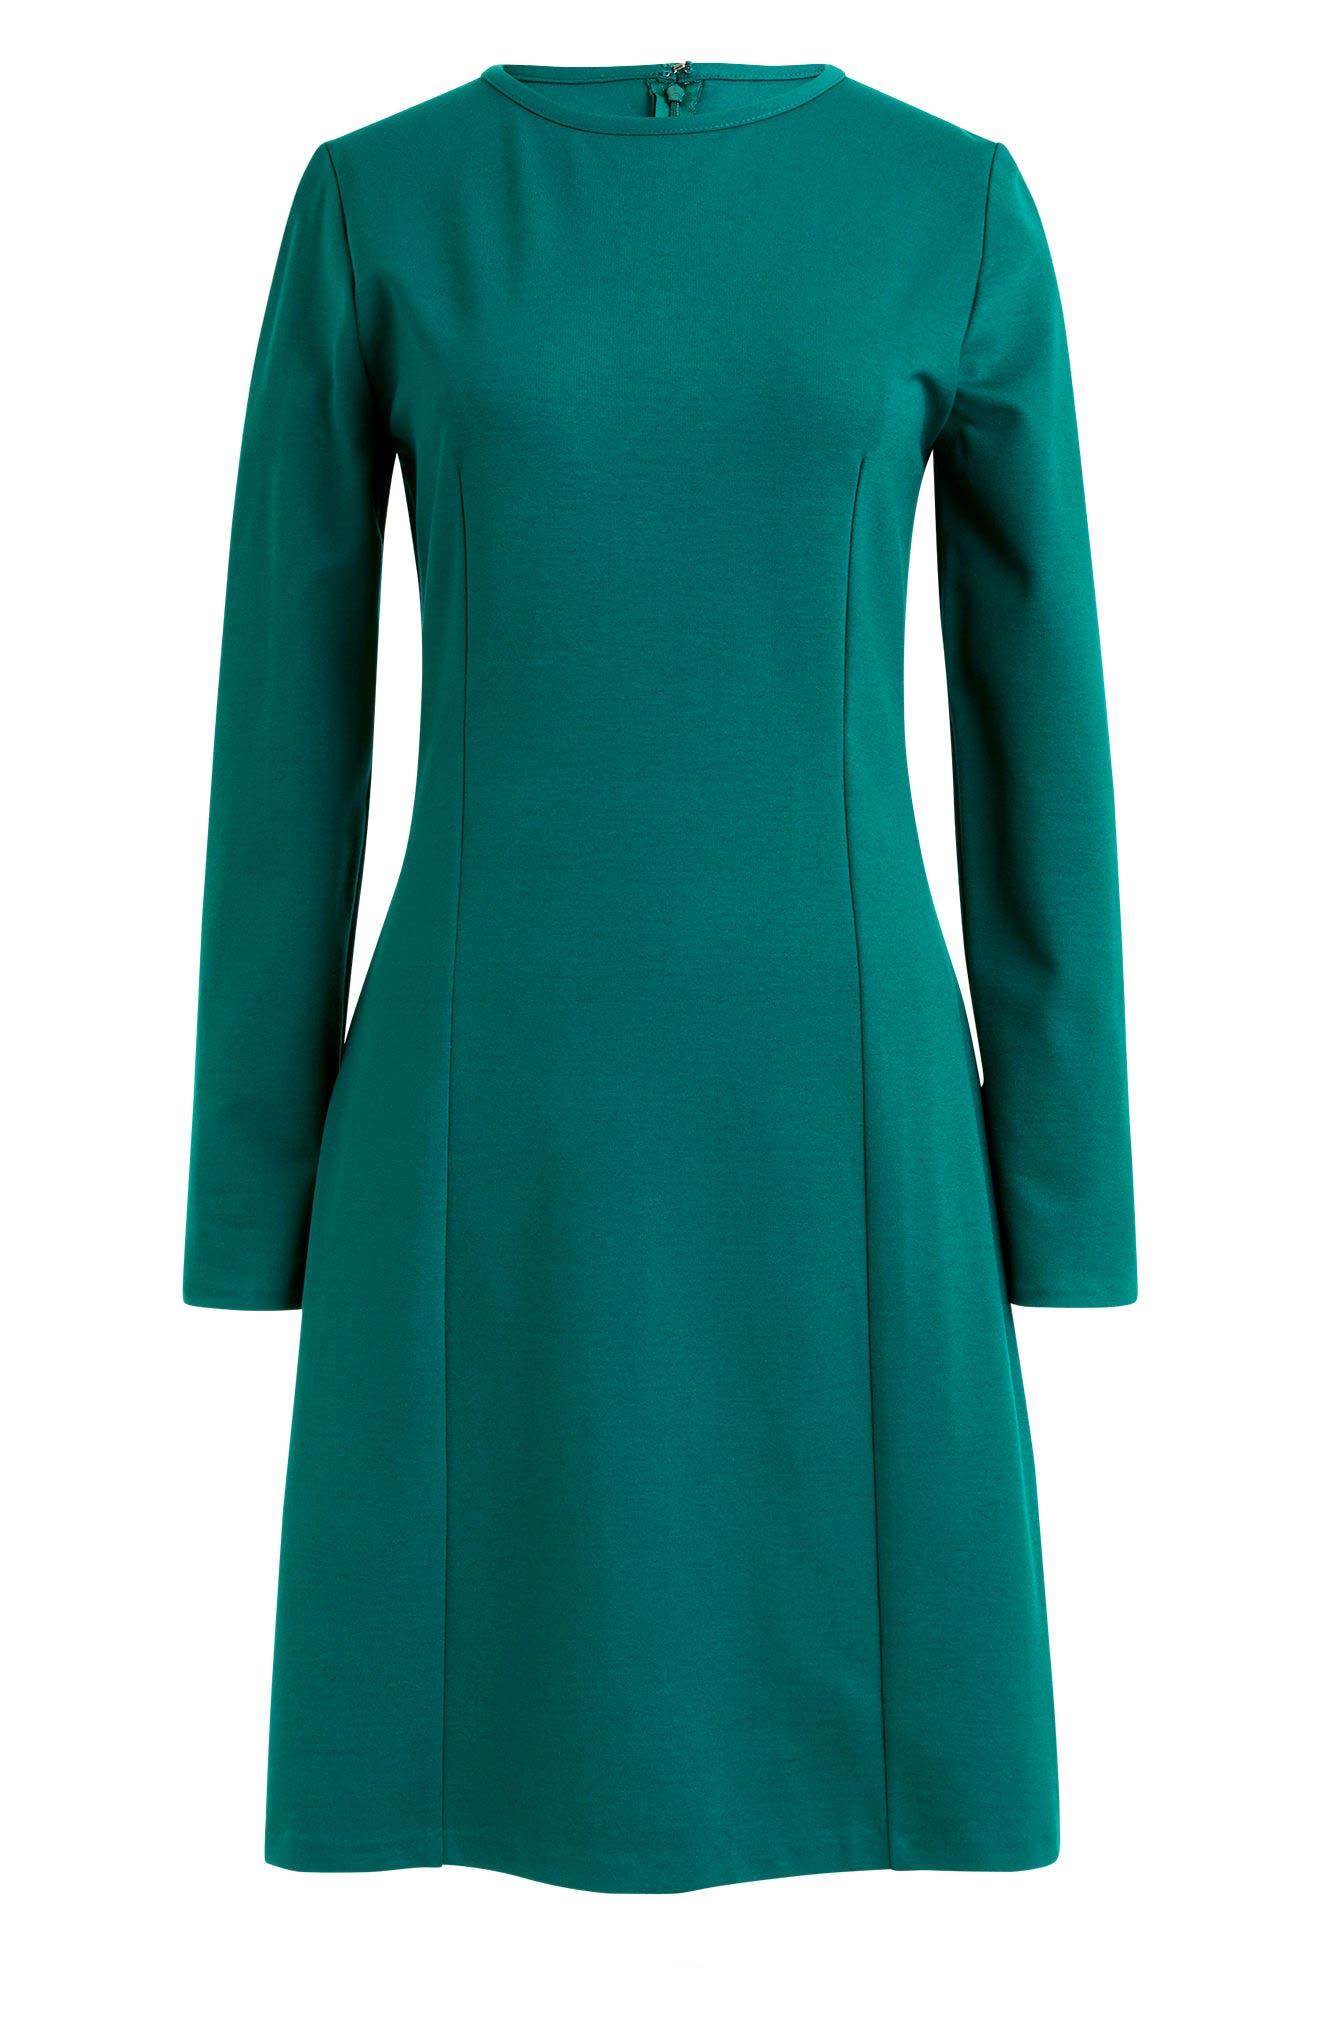 Storm Ponte Knit Dress,                             Alternate thumbnail 4, color,